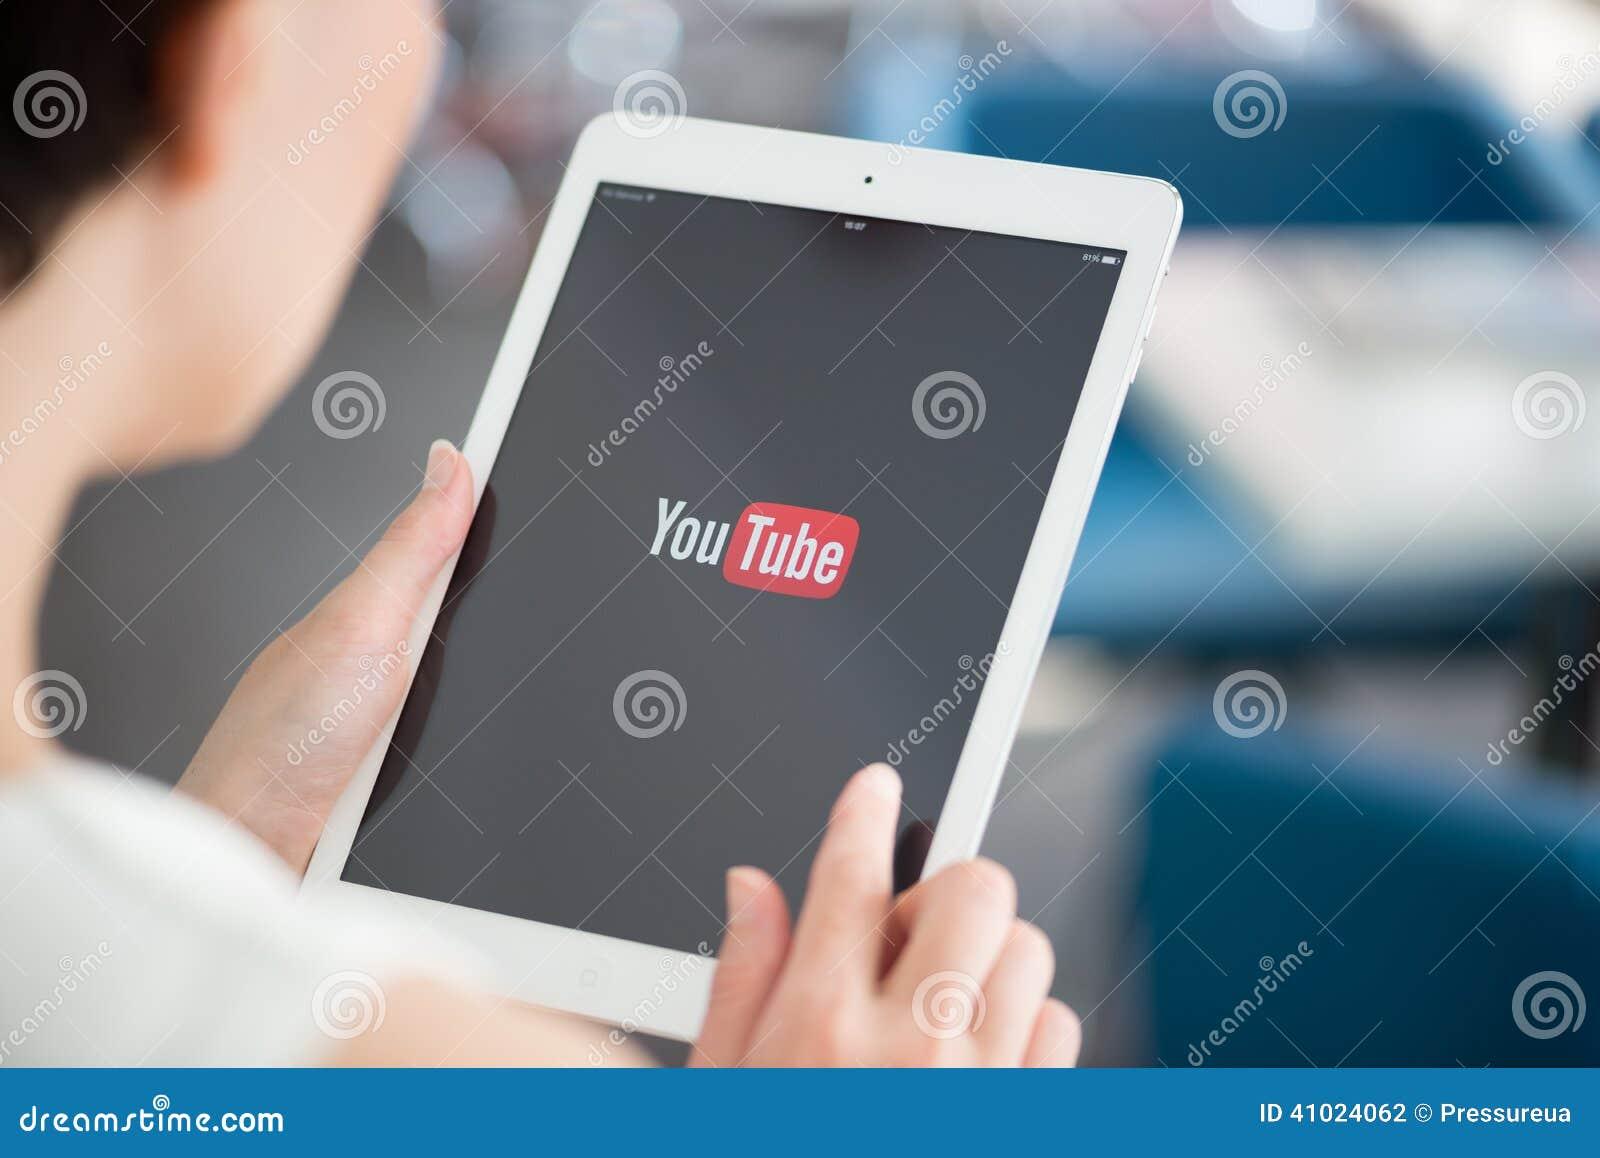 YouTube application on Apple iPad Air